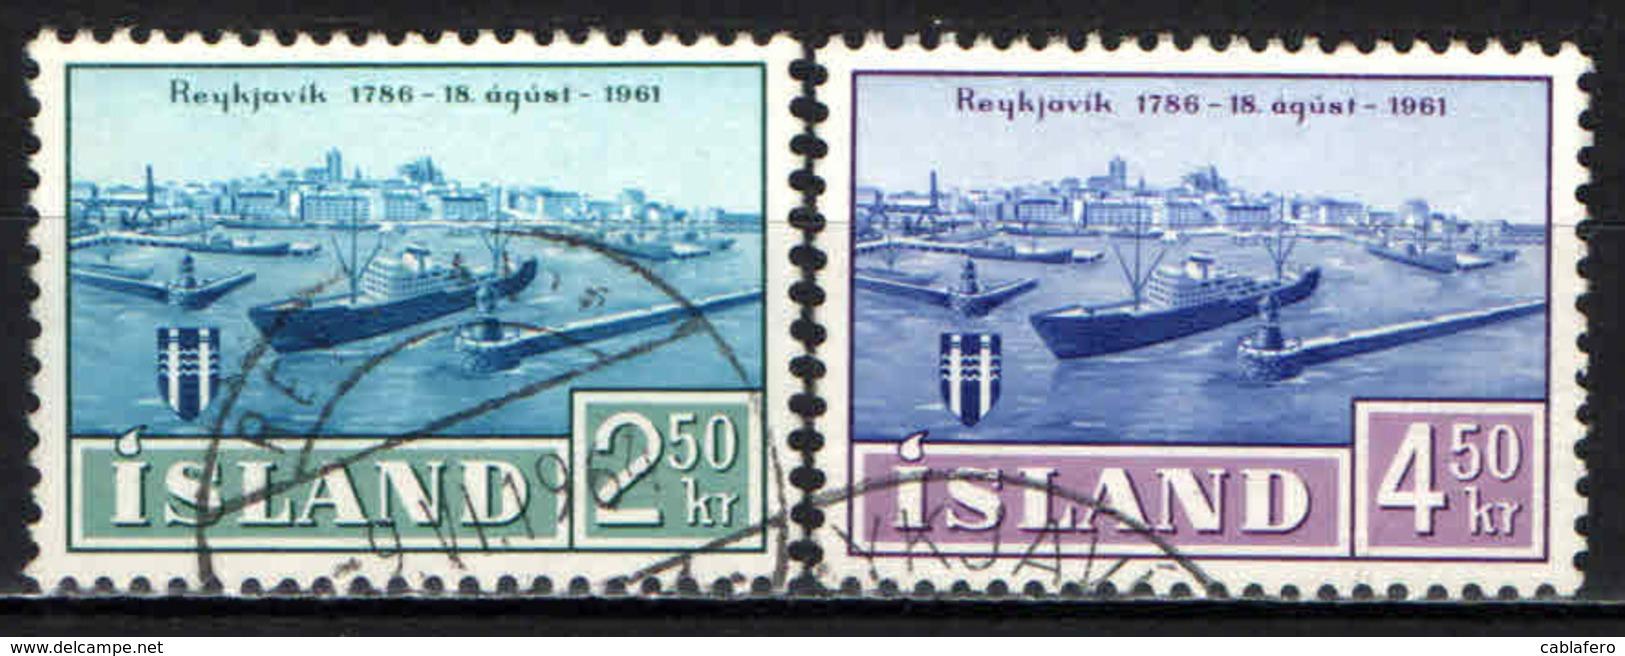 ISLANDA - 1961 - VEDUTE DELLA CITTA' DI REYKJAVIK - USATI - 1944-... Republik